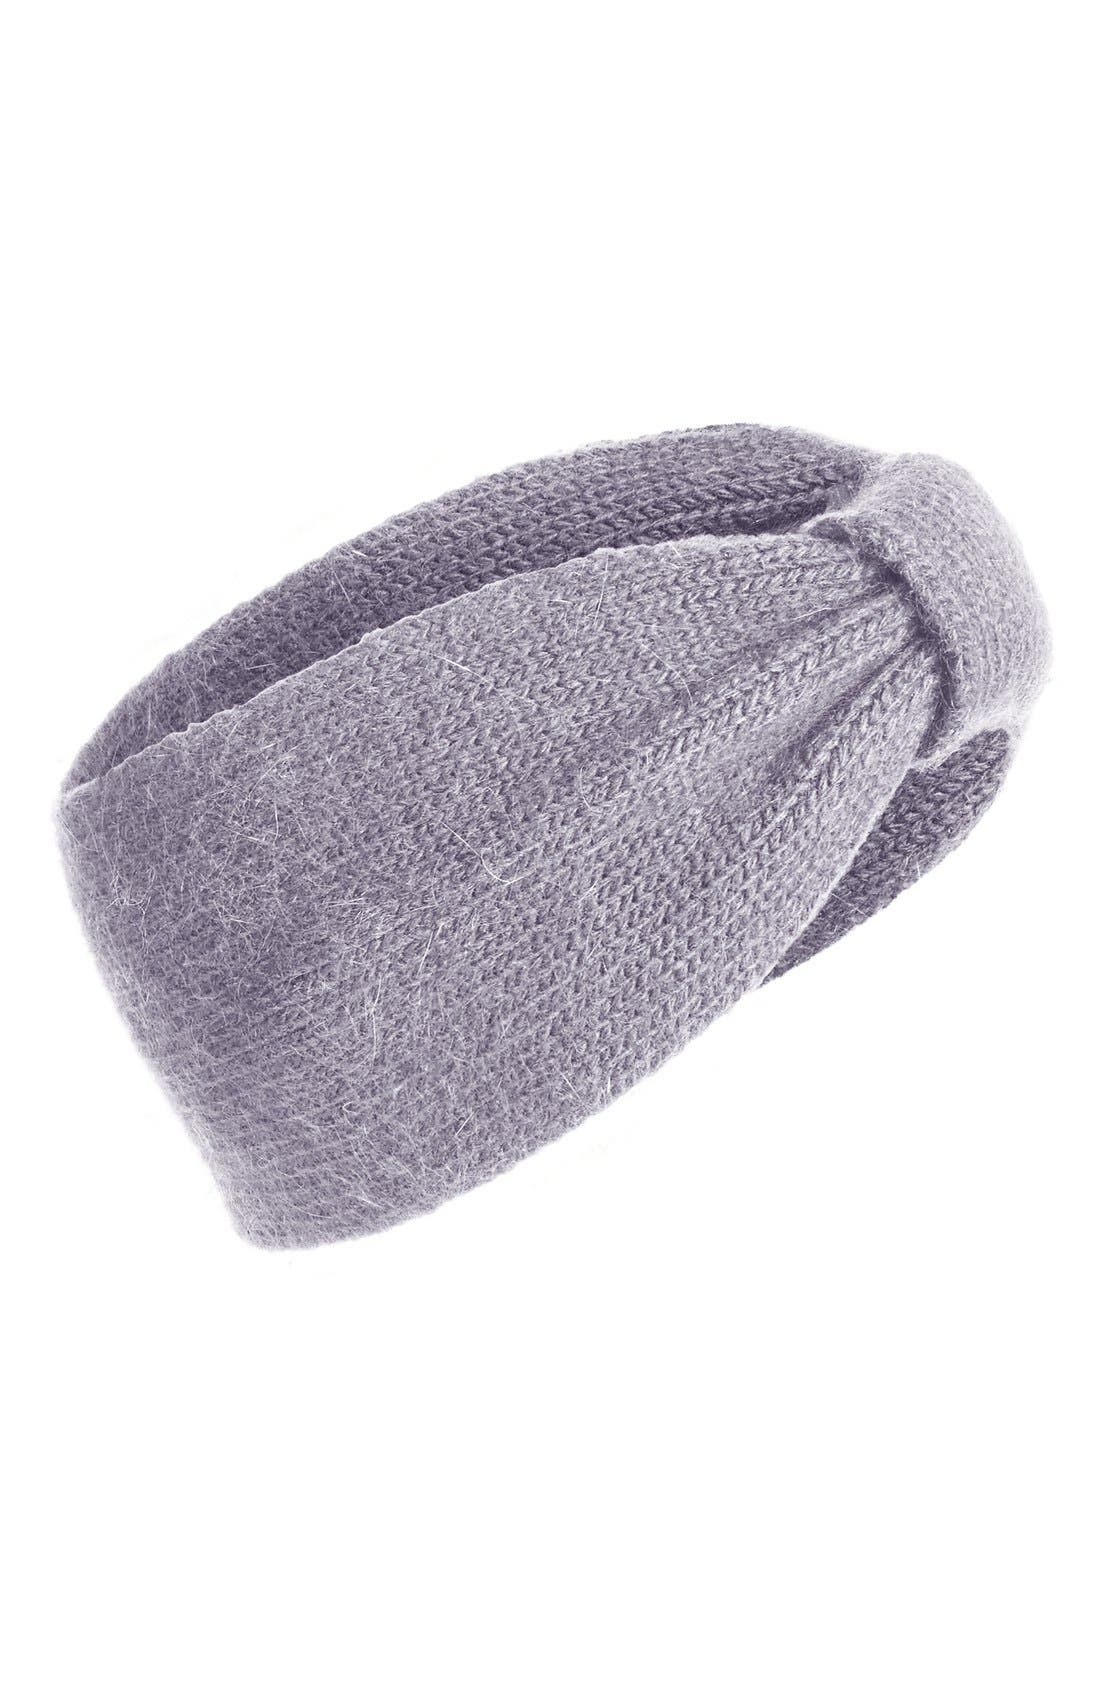 Alternate Image 1 Selected - Tasha Knit Head Wrap